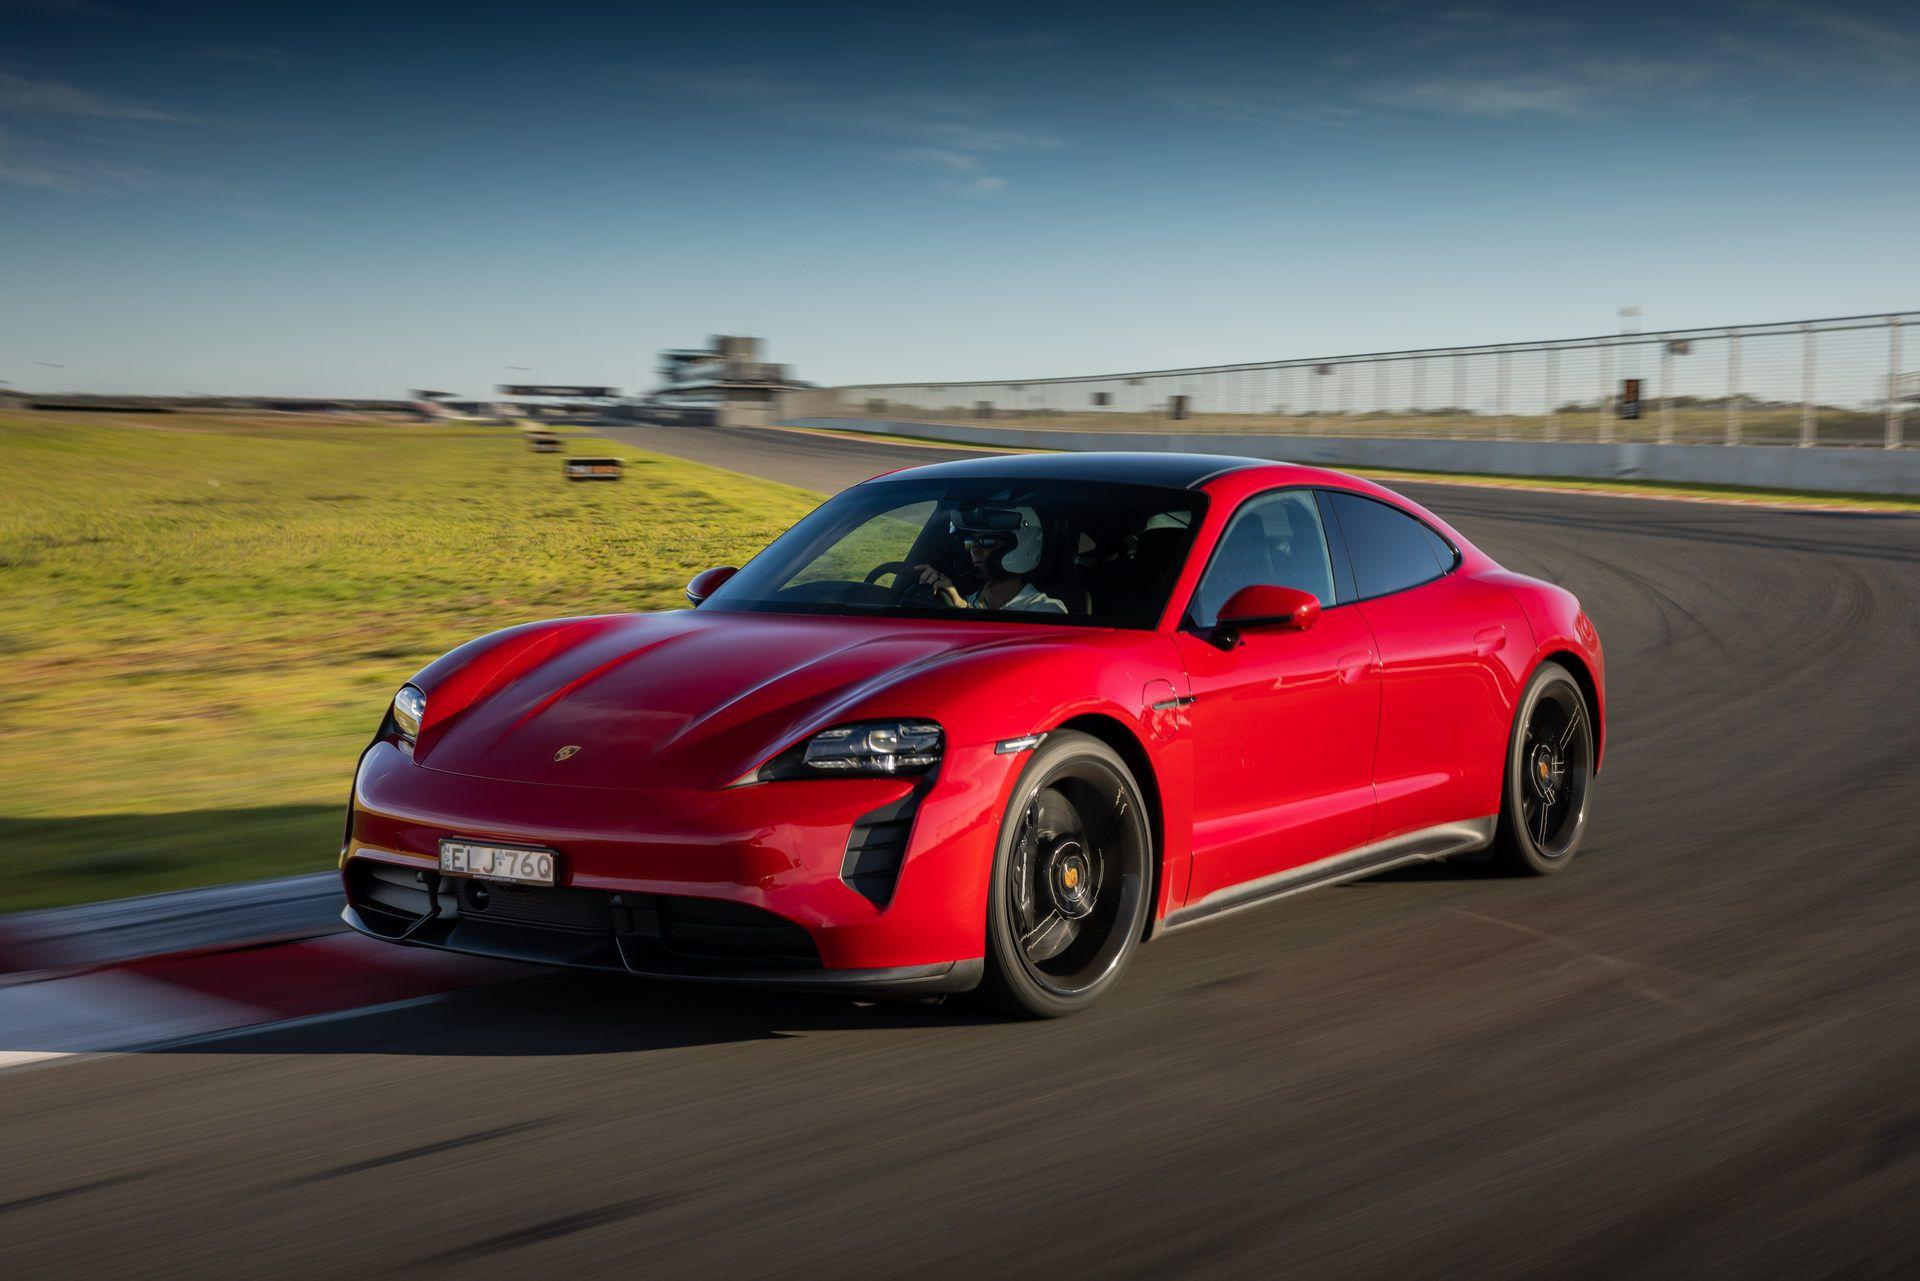 Porsche-Taycan-Turbo-S-The-Bend-Motorsport-Park-25